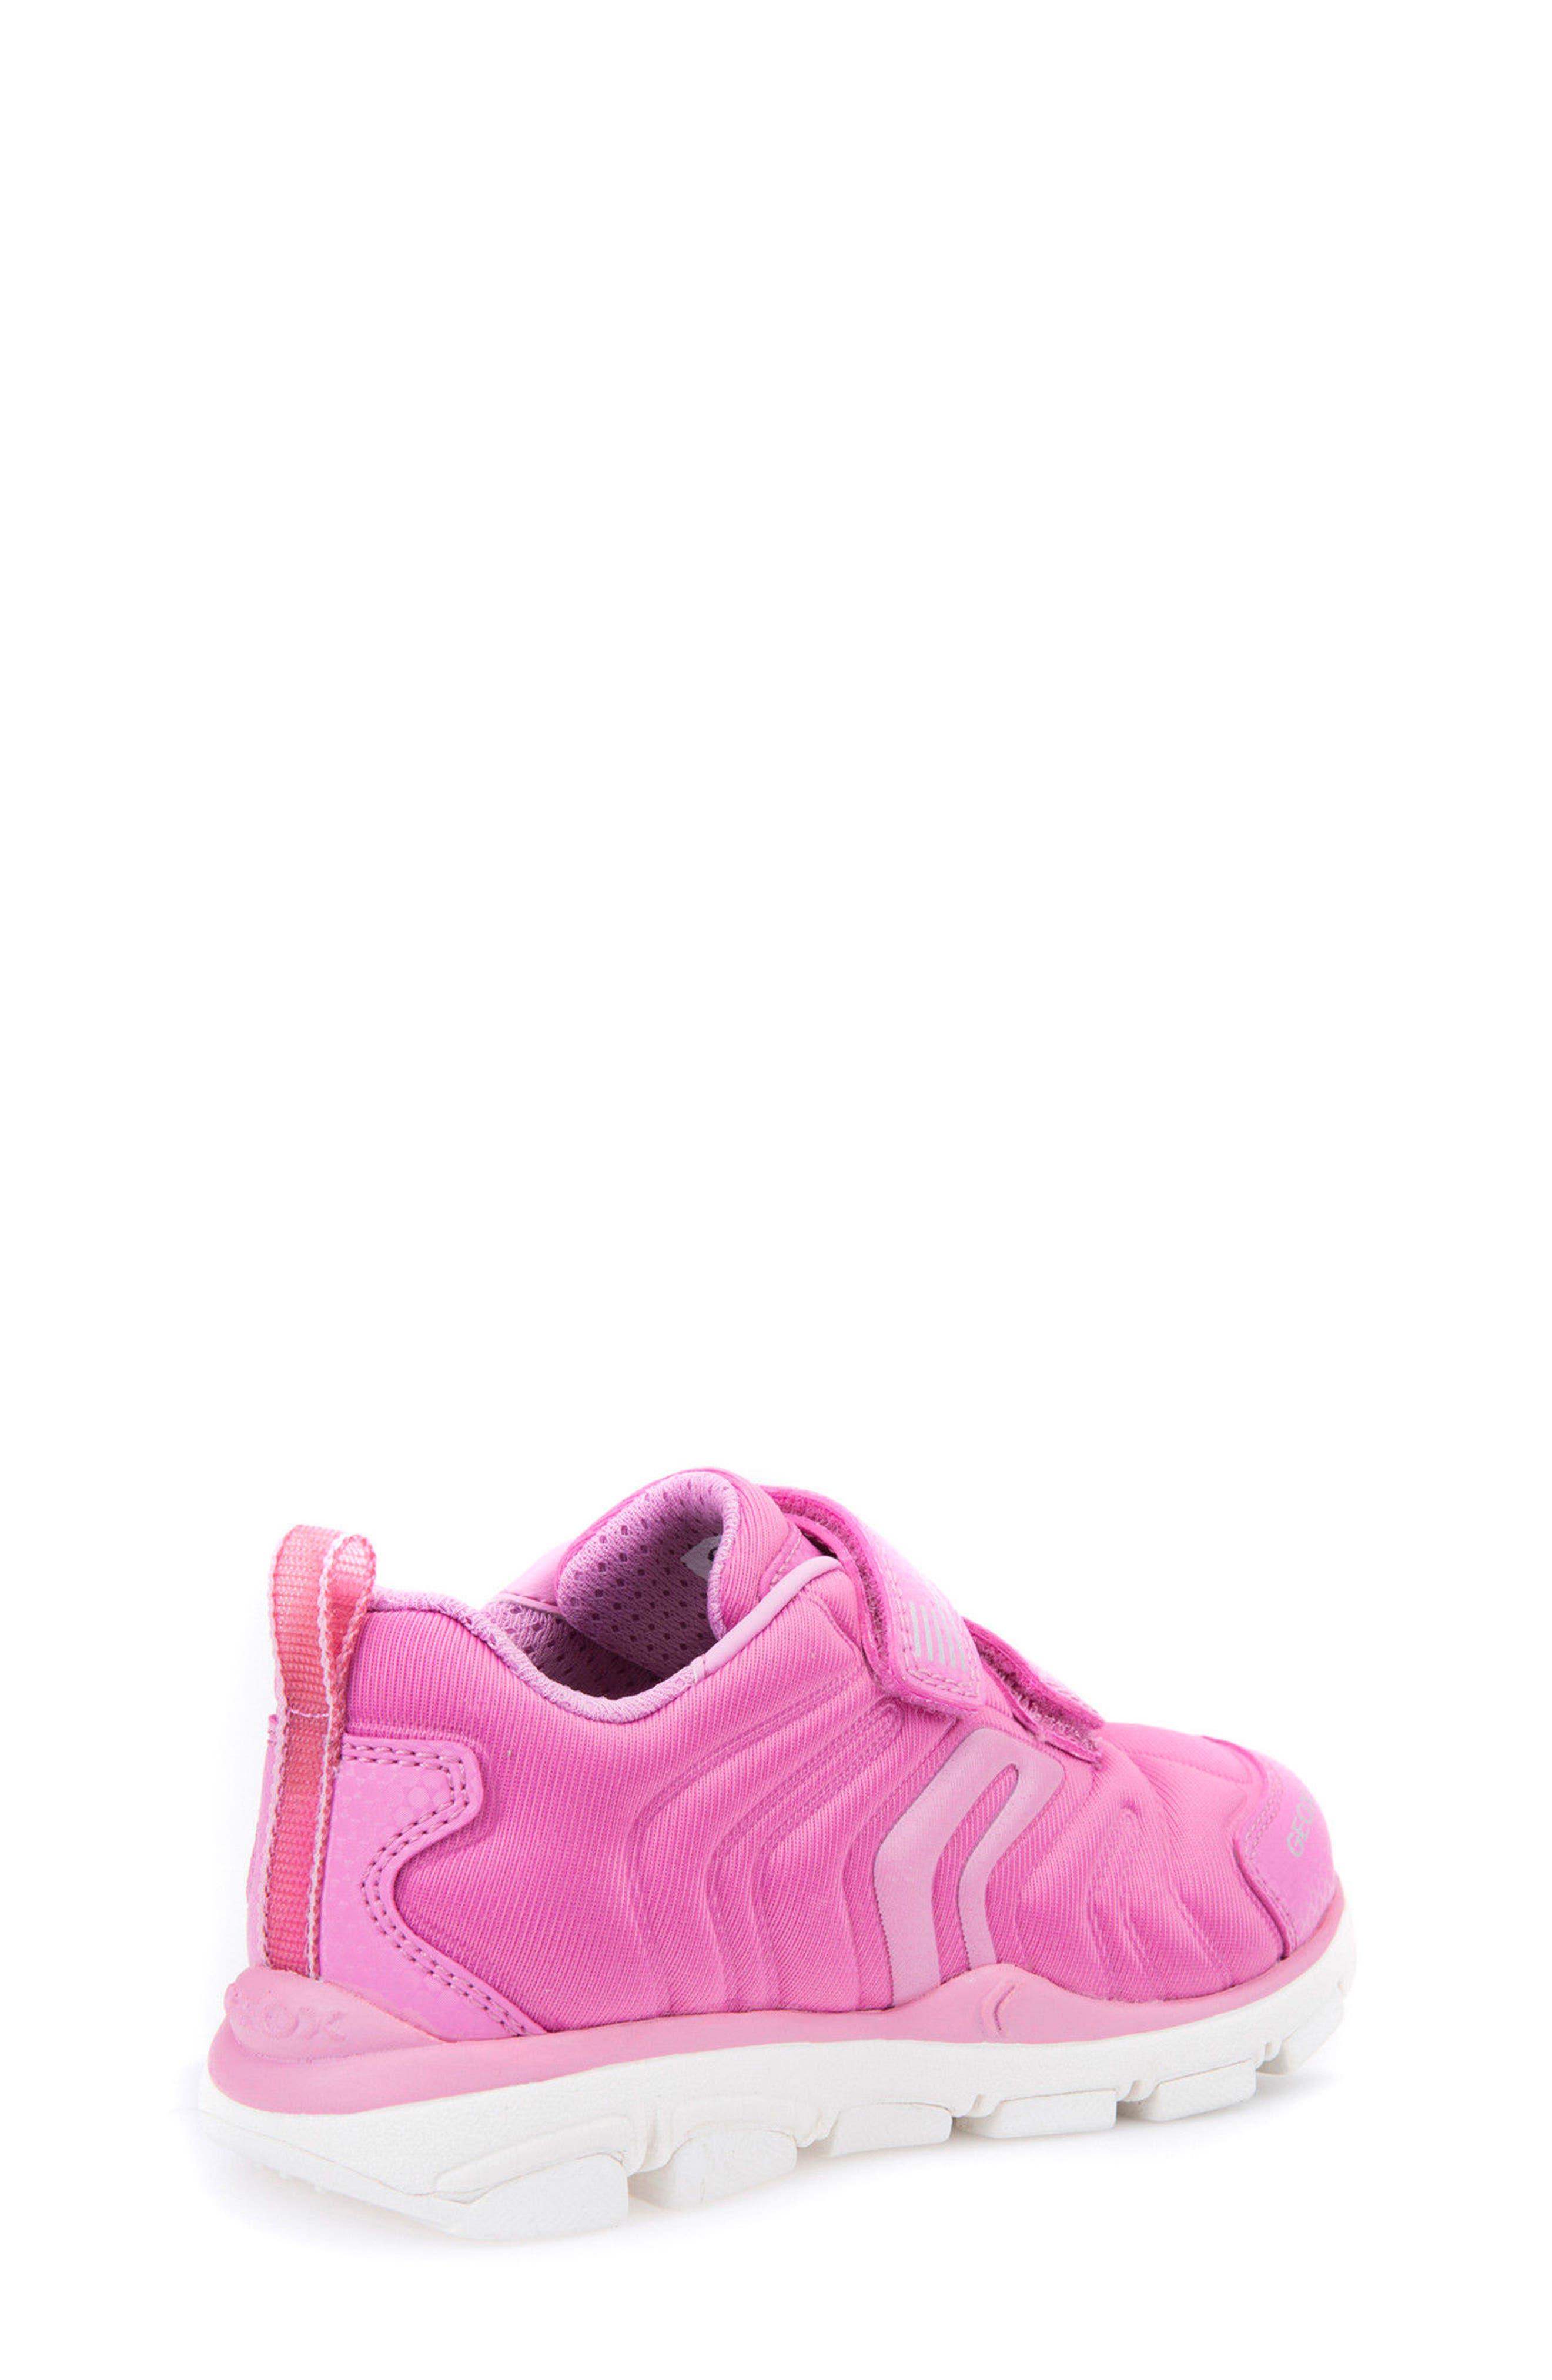 Torque Sneaker,                             Alternate thumbnail 7, color,                             Fuchsia/ Dark Pink